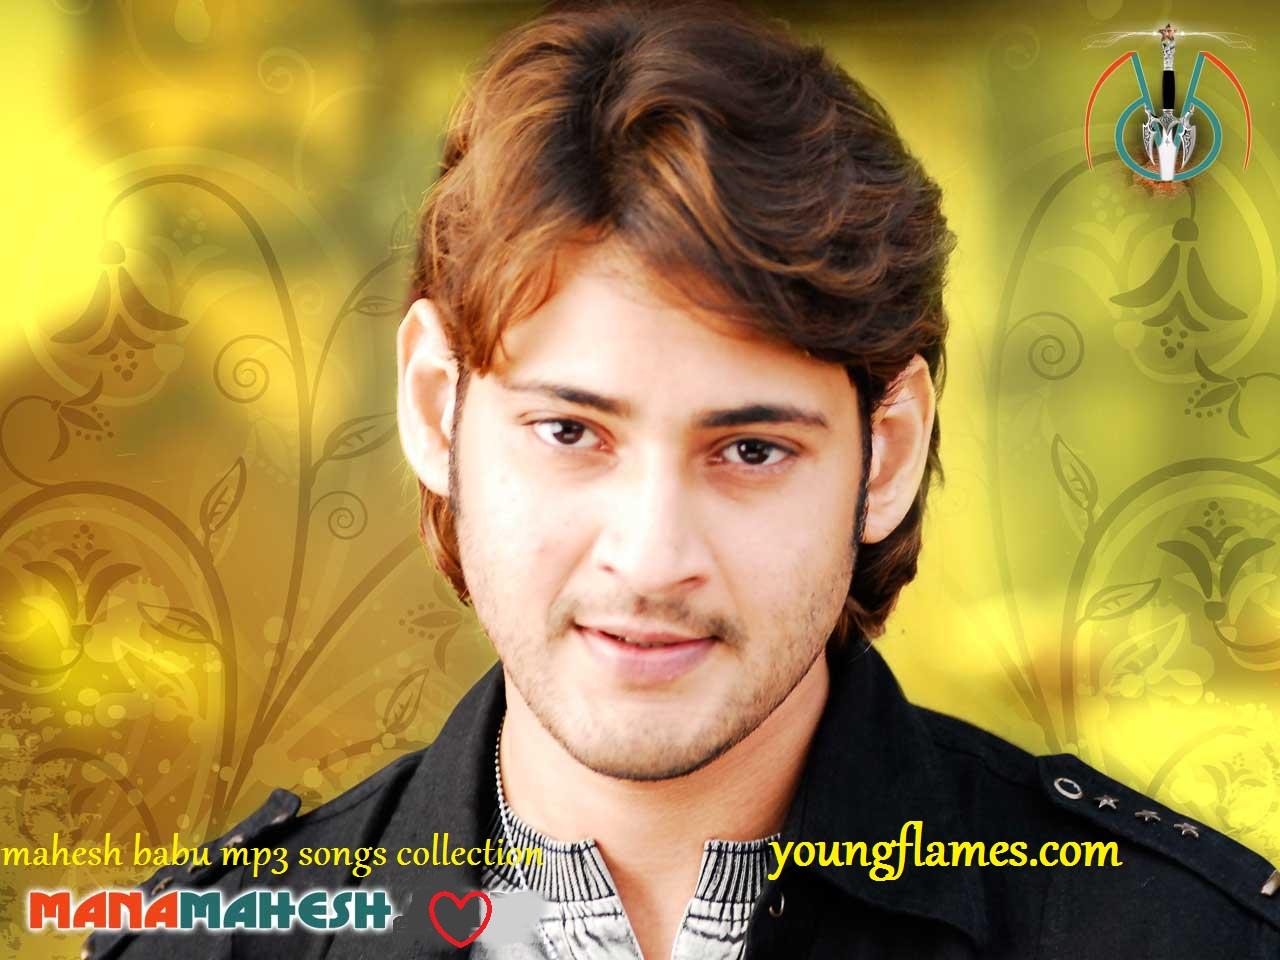 telugu mp3 songs: mahesh babu collection – telugu mp3 songs all